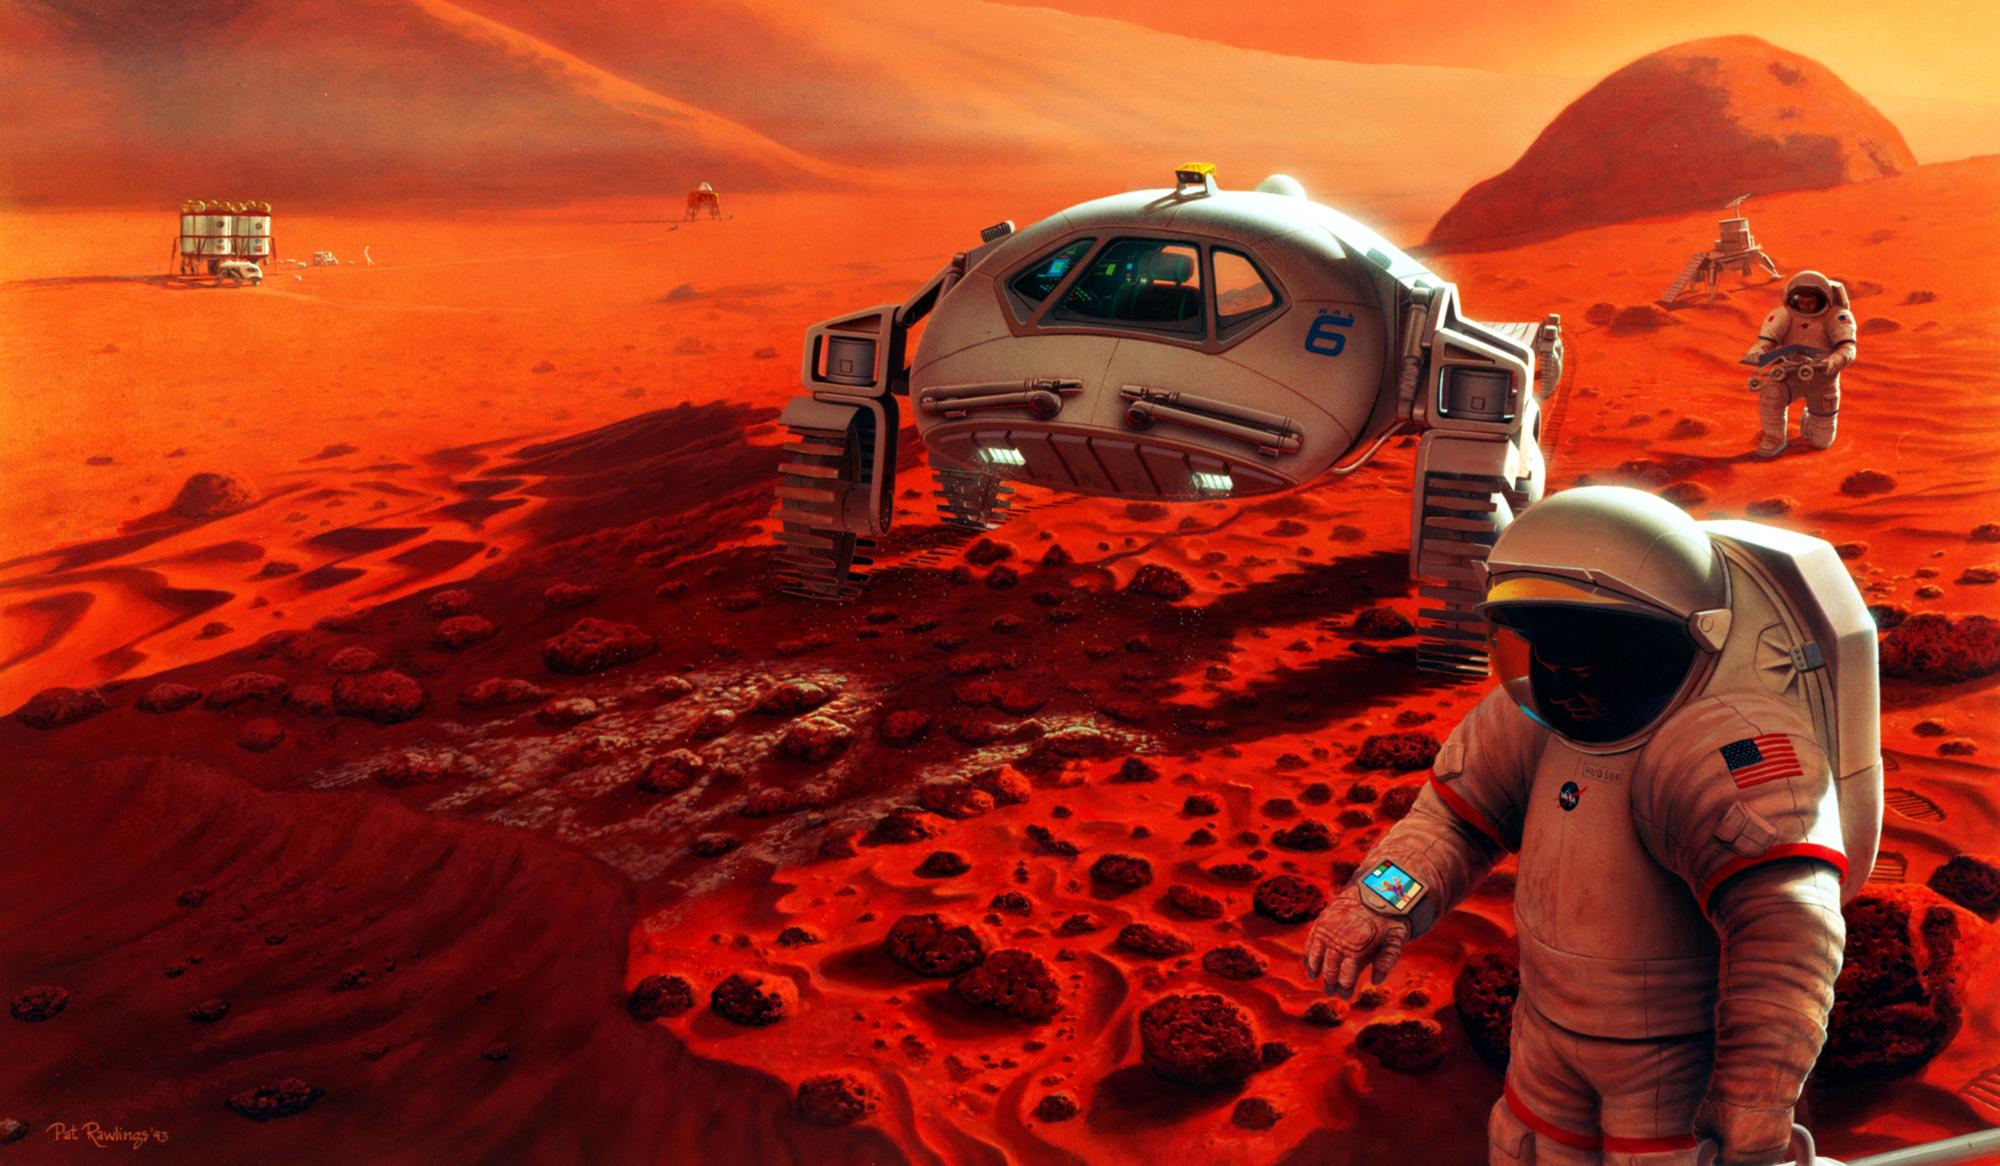 US Needs a Mars Colony, Buzz Aldrin Tells Senators | Space